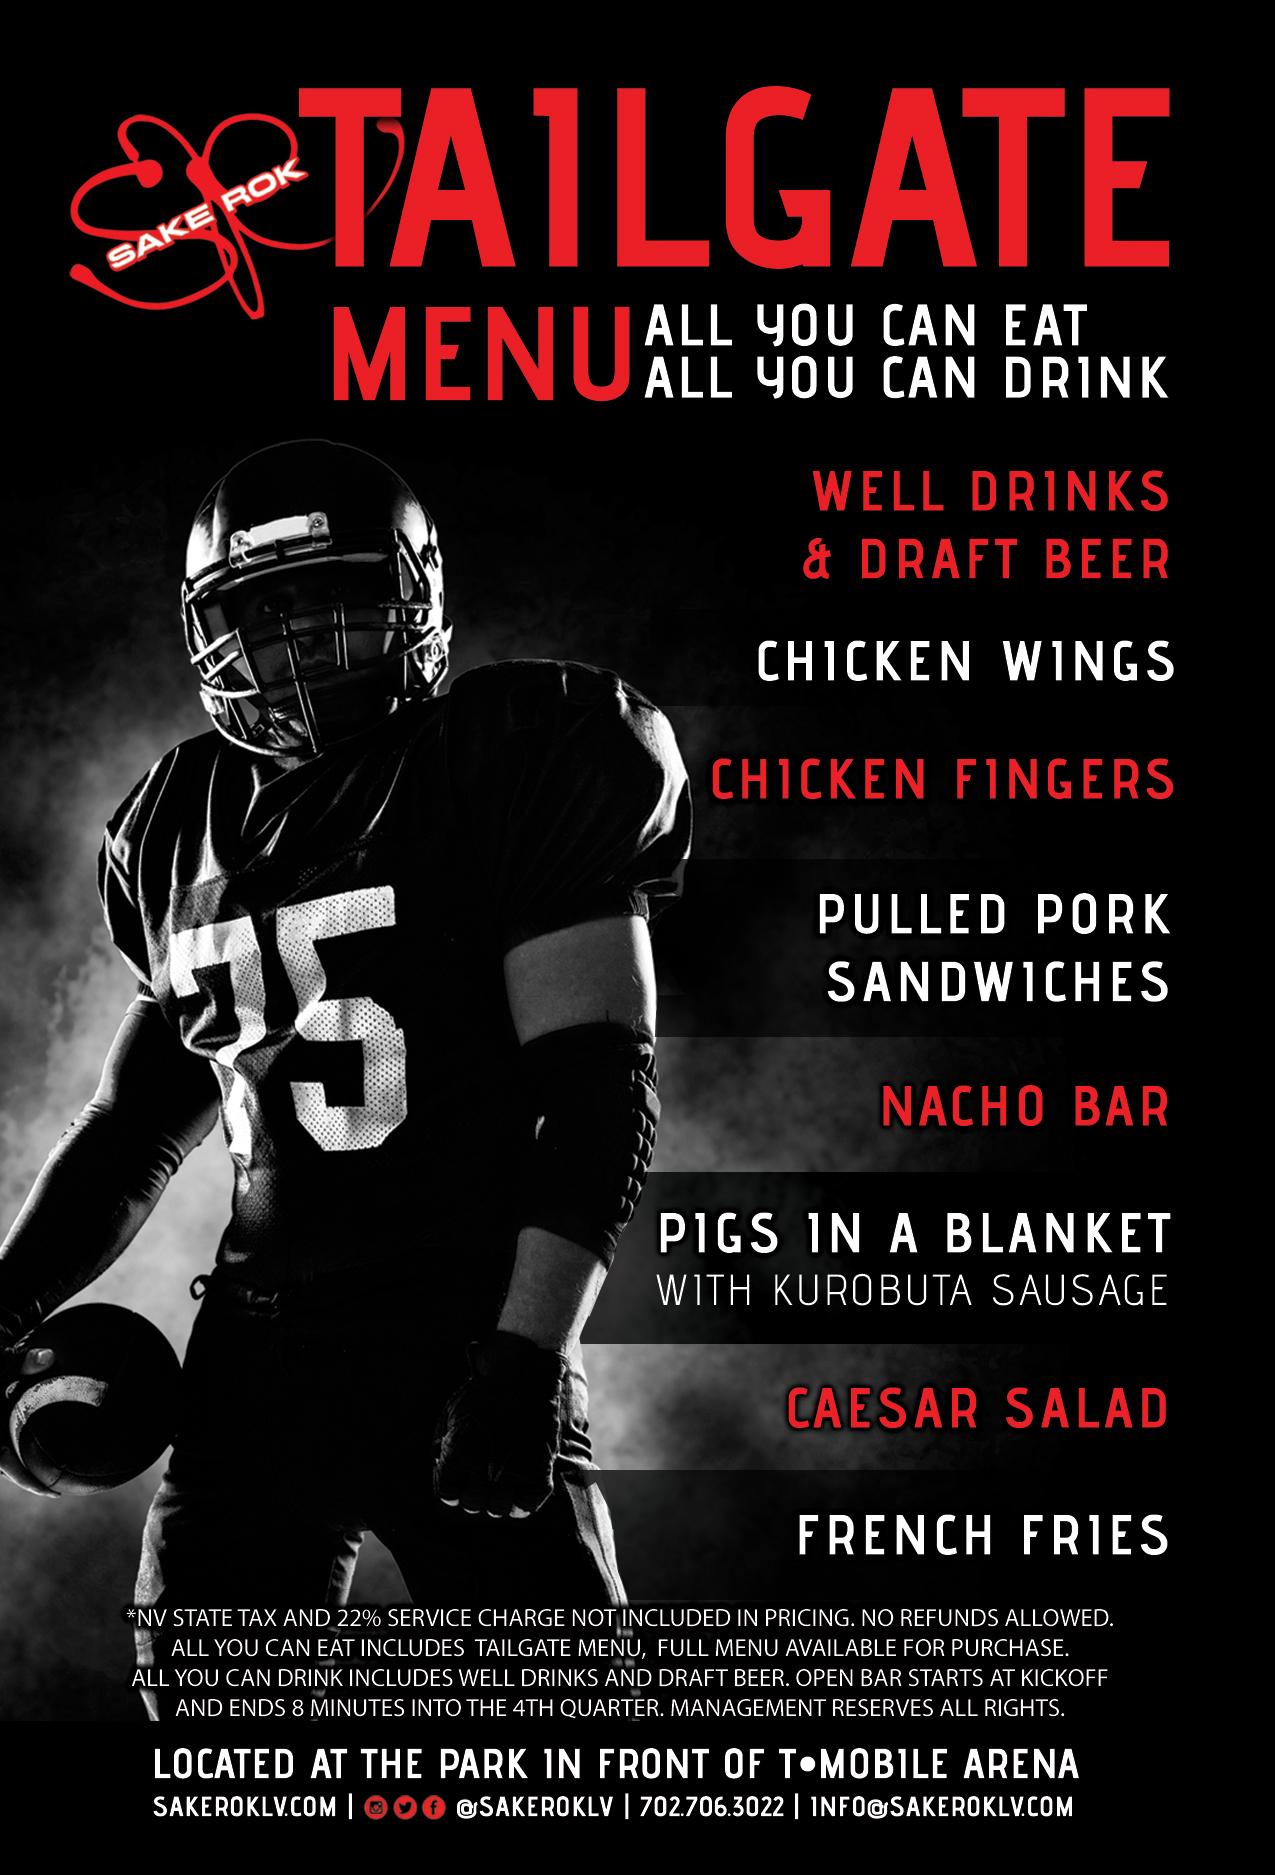 Big Game Tailgate Food and Drink Menu